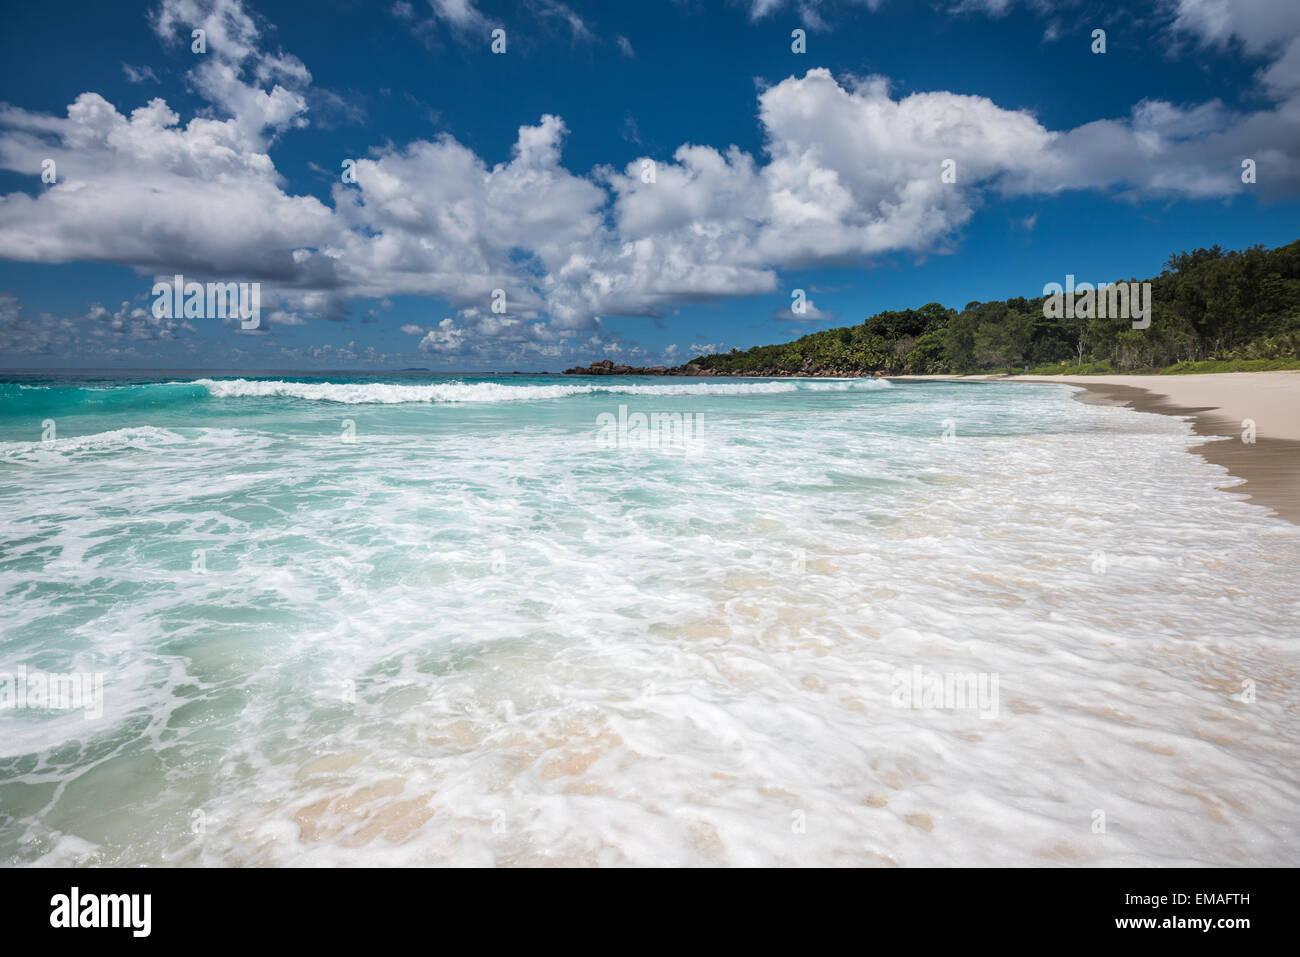 Anse Coco tropical beach, La Digue island, Seychelles - Stock Image